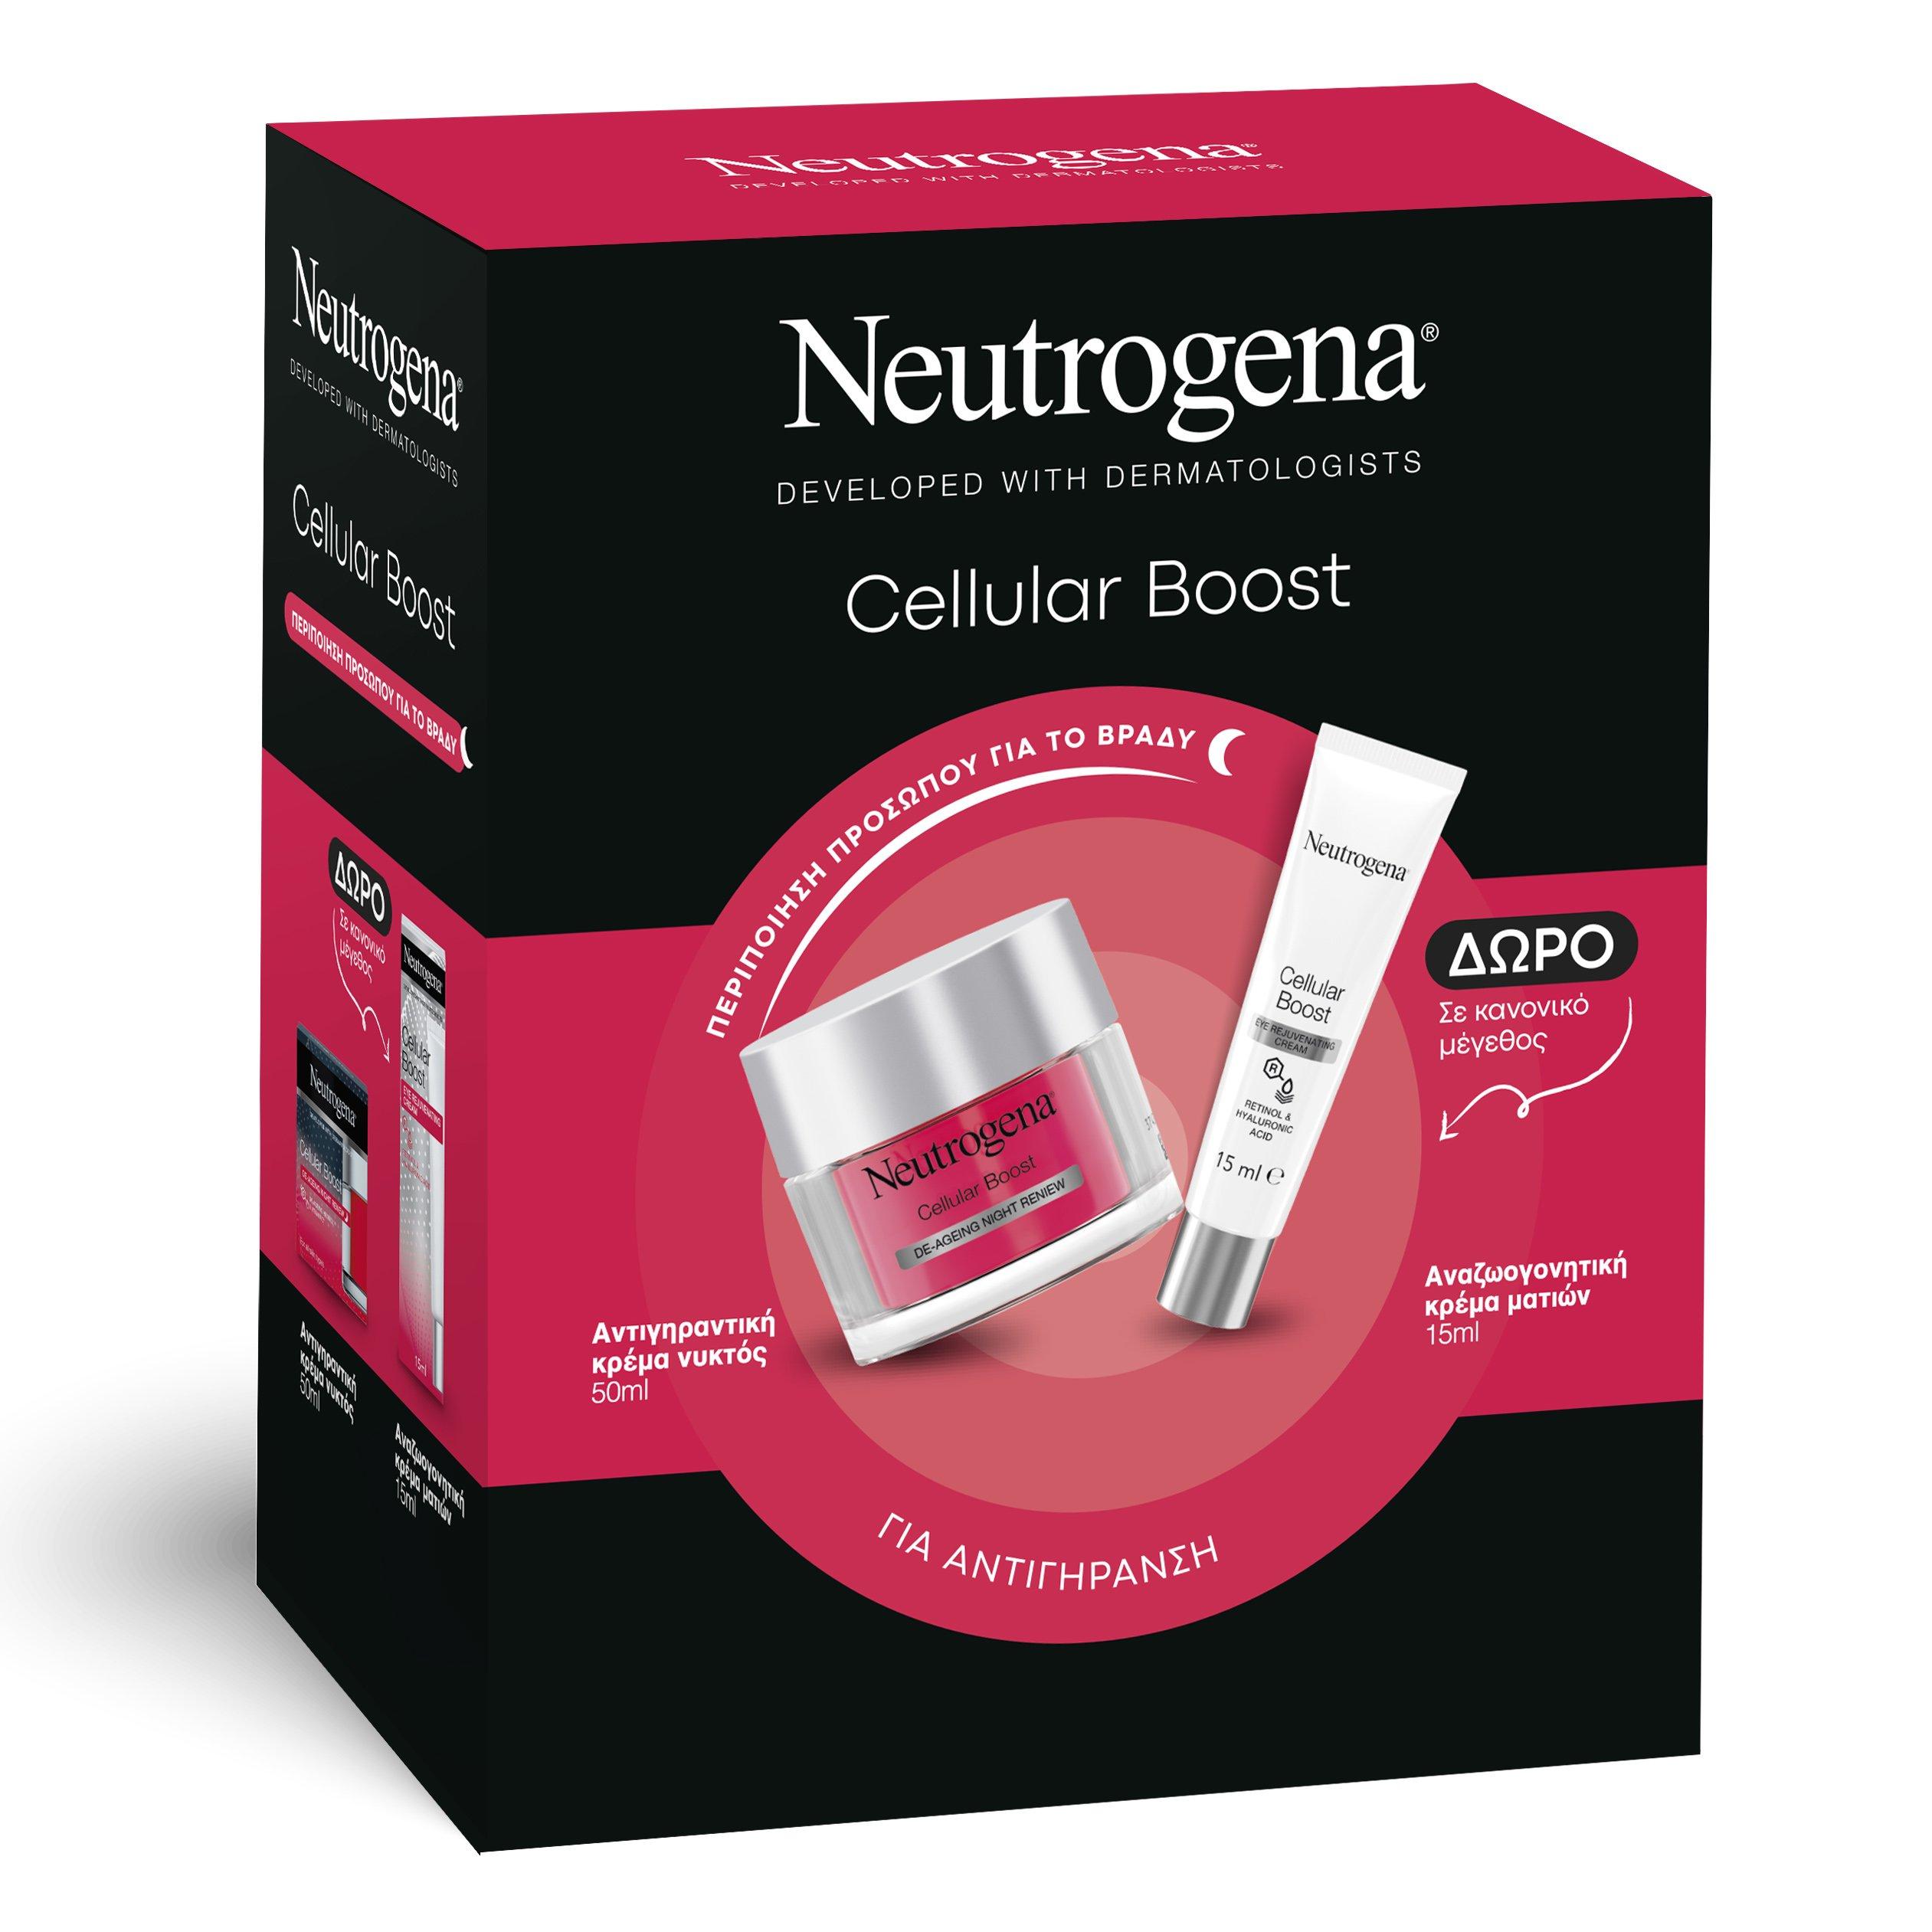 Neutrogena Πακέτο Προσφοράς Cellular Boost De-Ageing Night Reniew 50ml & Δώρο Cellular Boost Eye Rejuvenating Cream 75ml